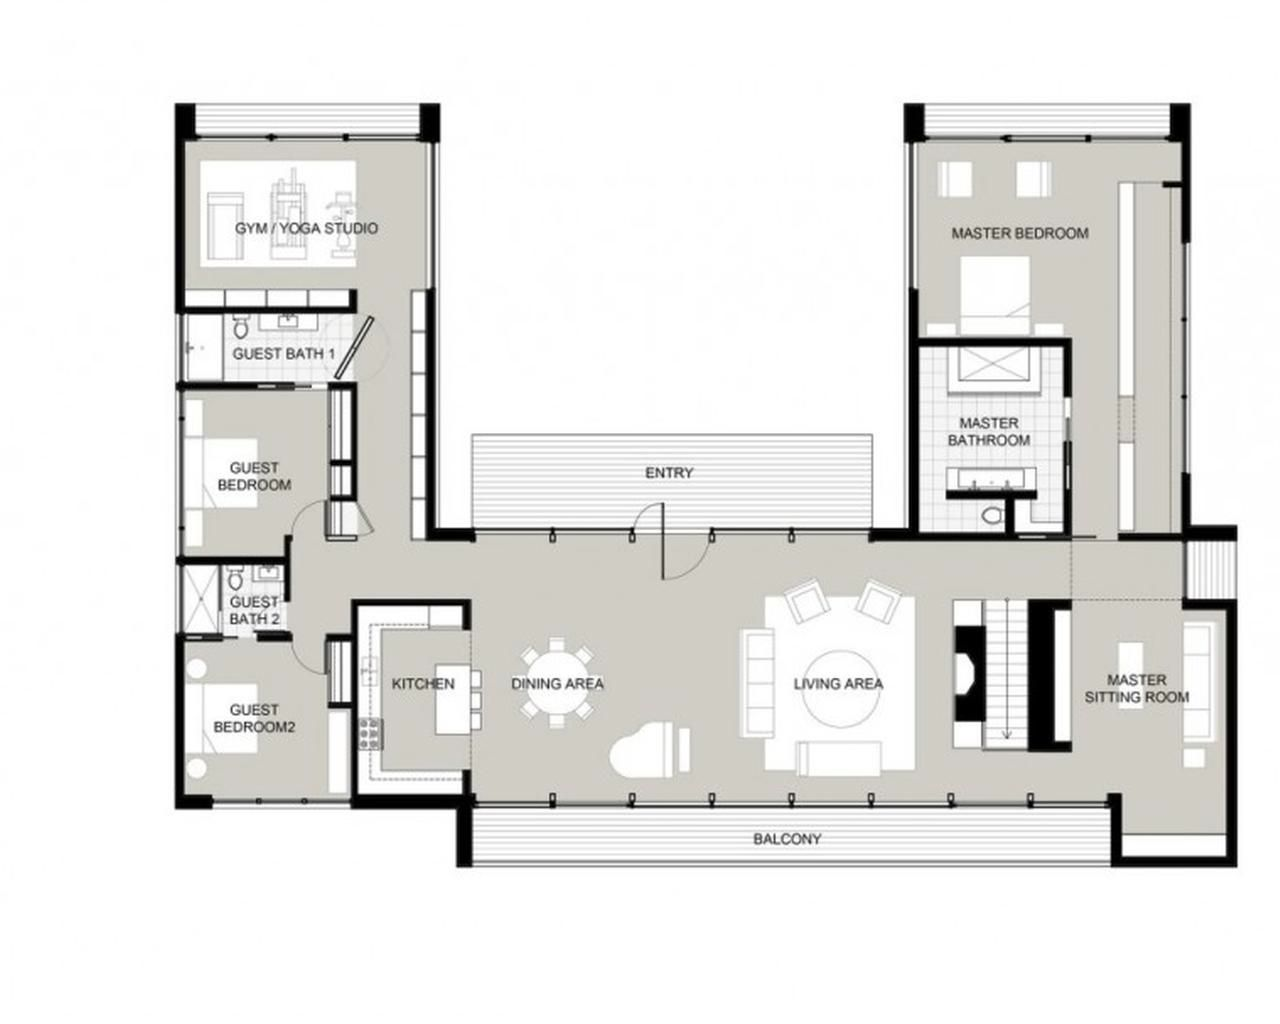 U Shaped House Floor Plans Vibrant Inspiration 9 Design Ideas Modern Lovely Pool House Plans Container House Plans U Shaped House Plans